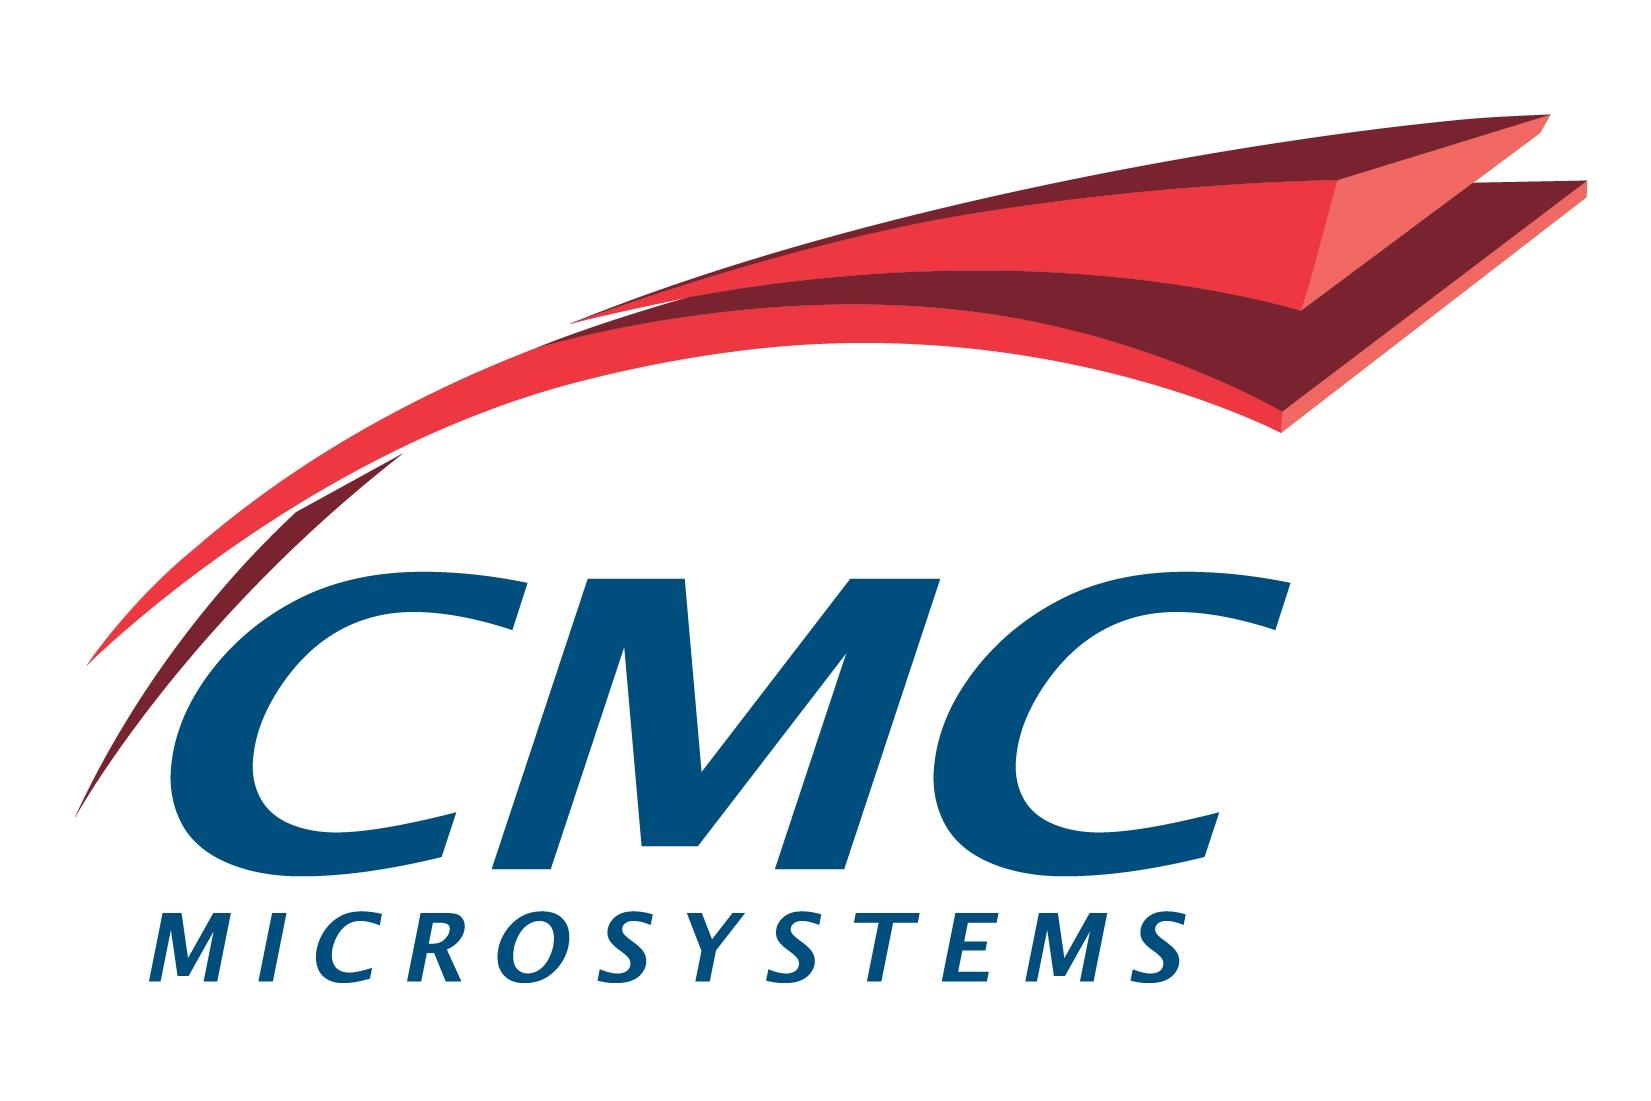 CMC Microsystems